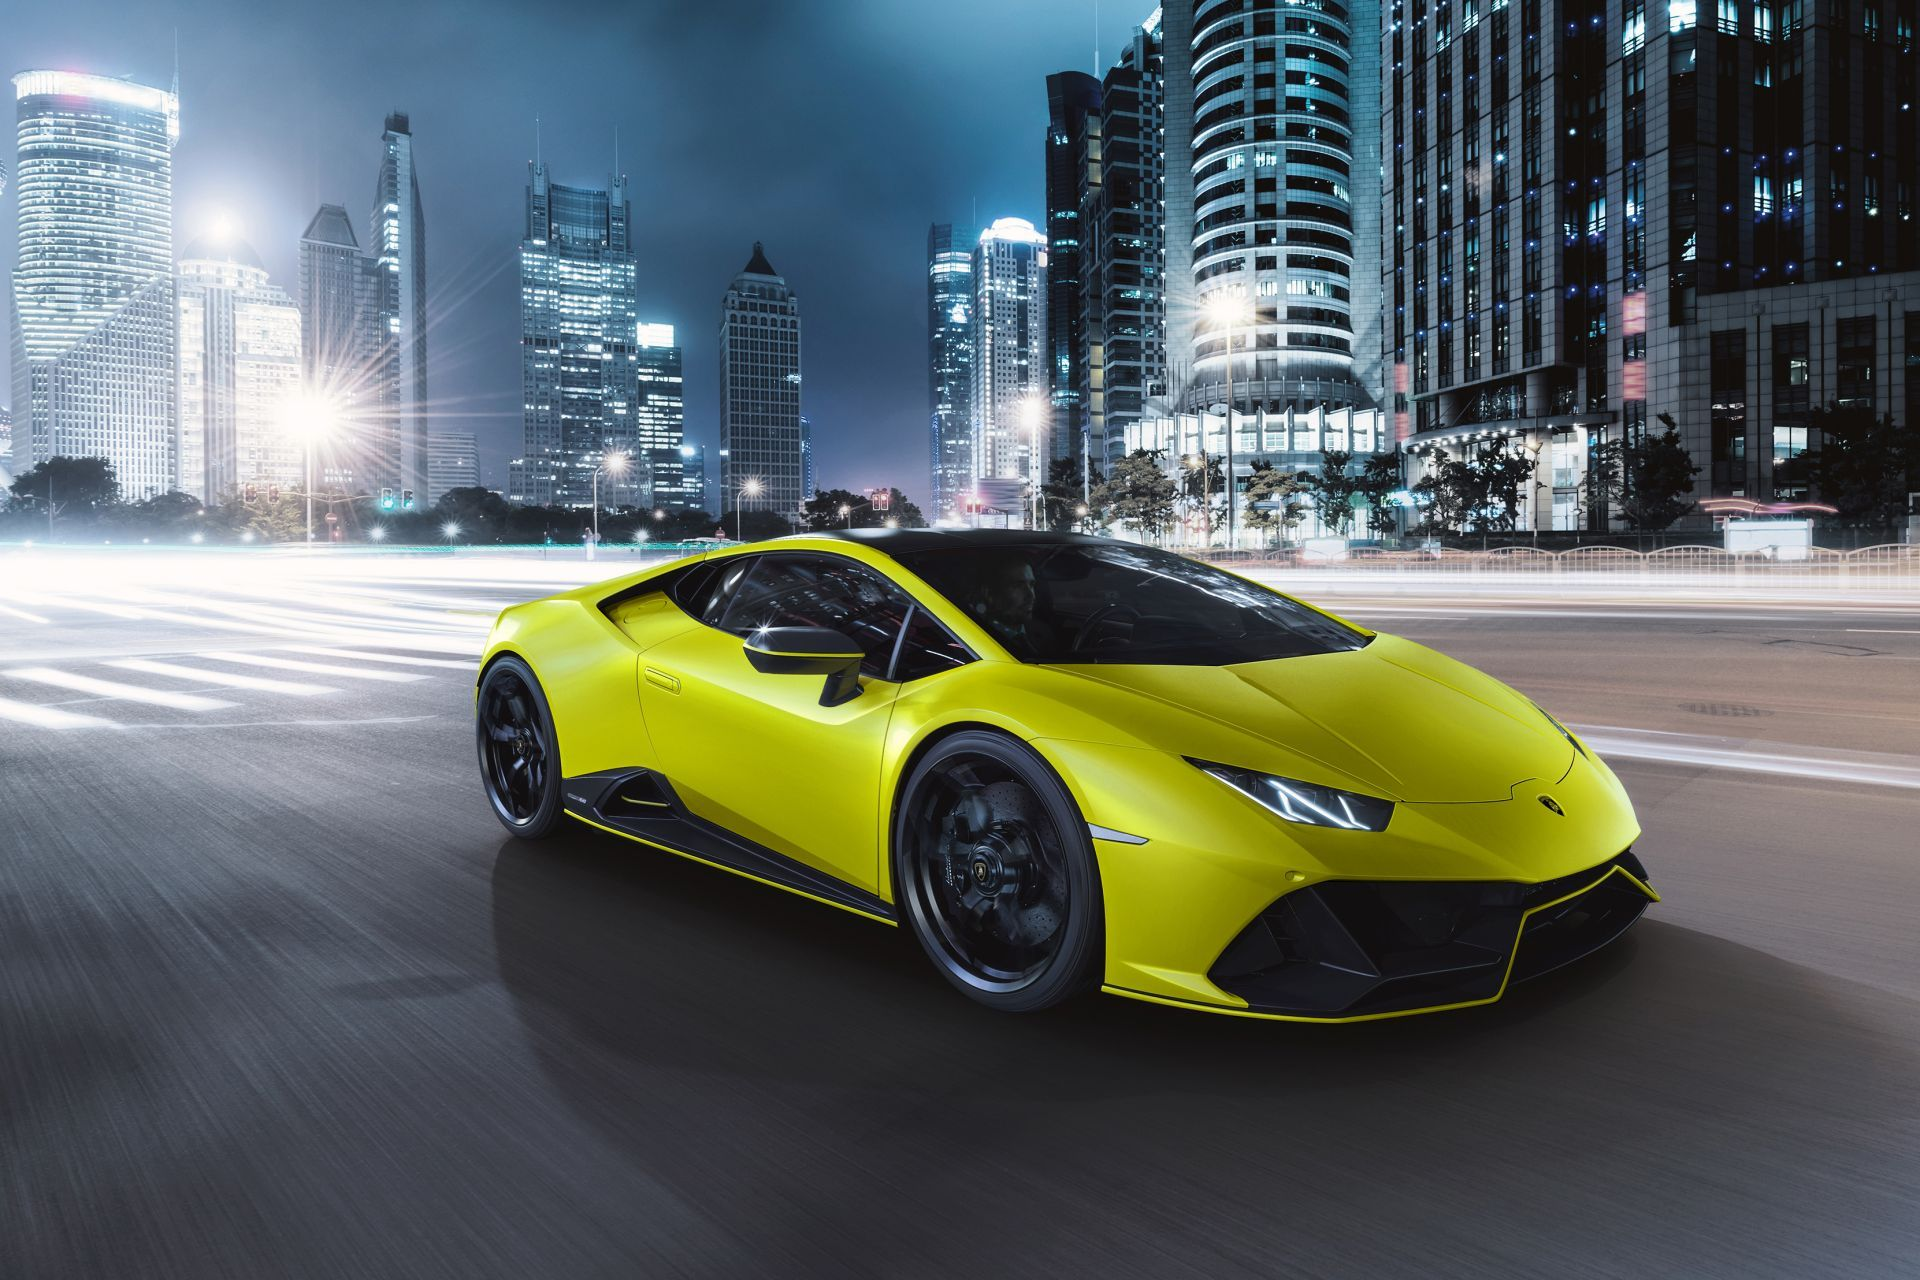 Lamborghini-Huracan-Evo-Fluo-Capsule-1